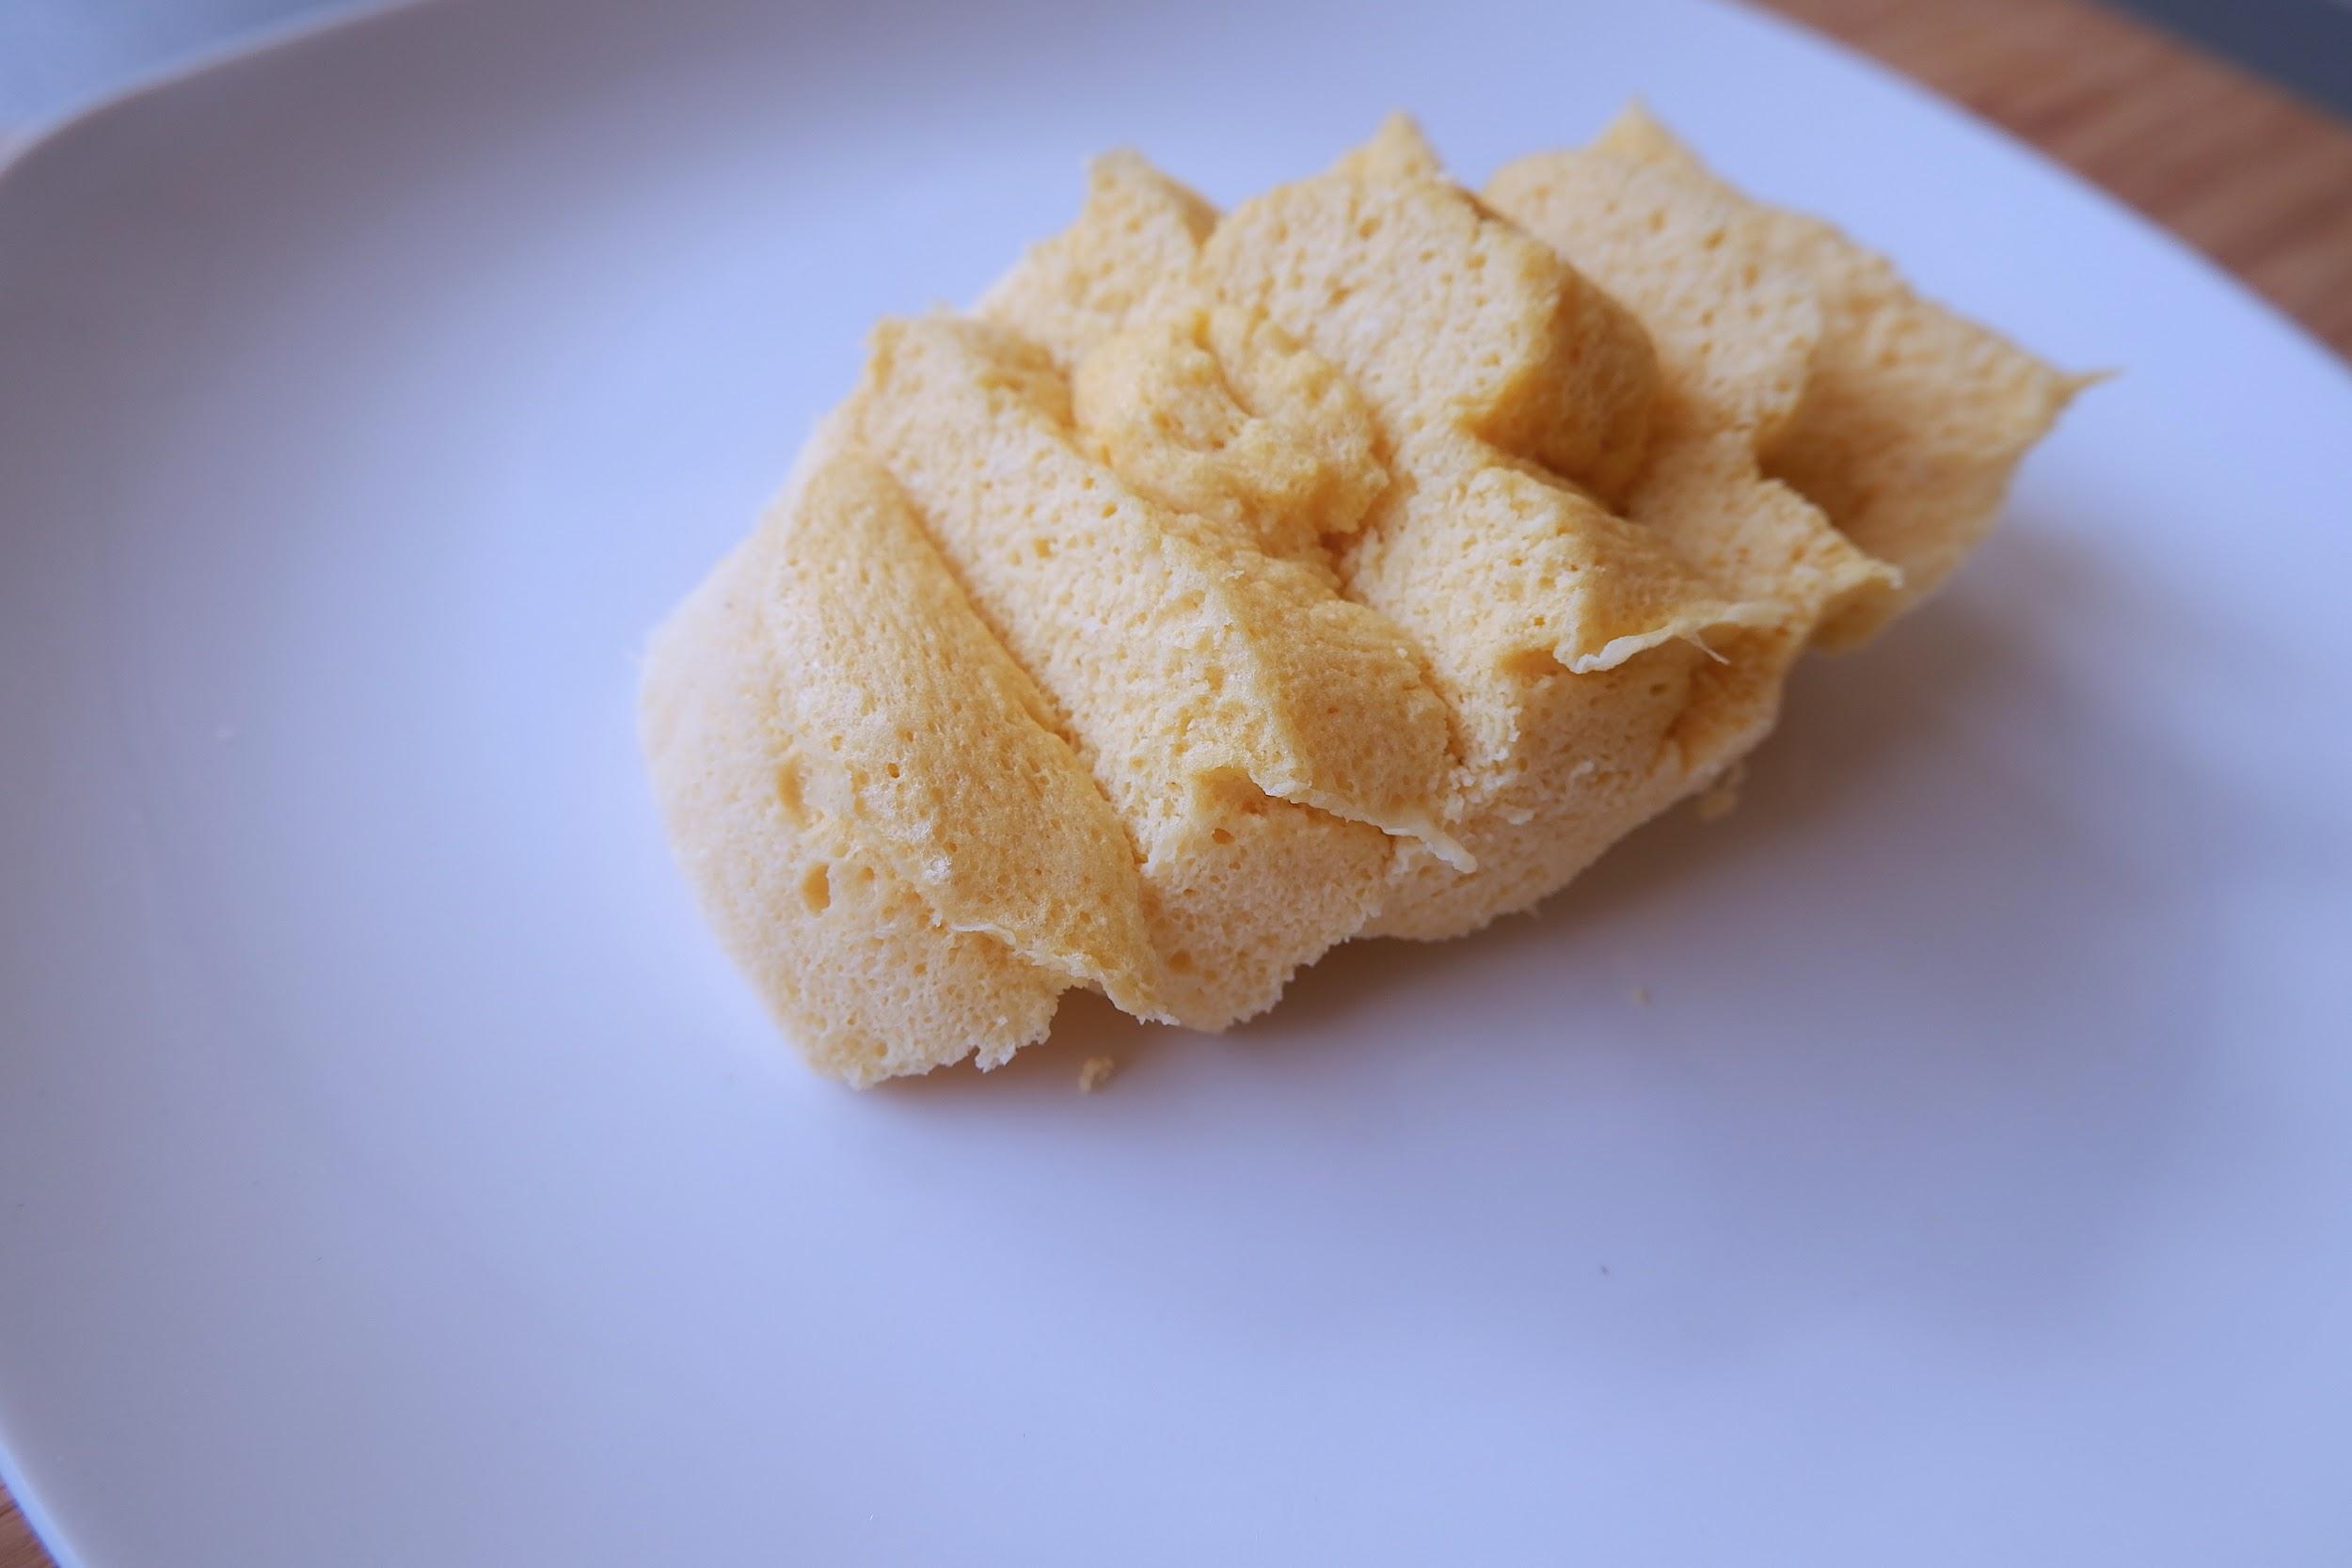 One Minute Keto Muffin